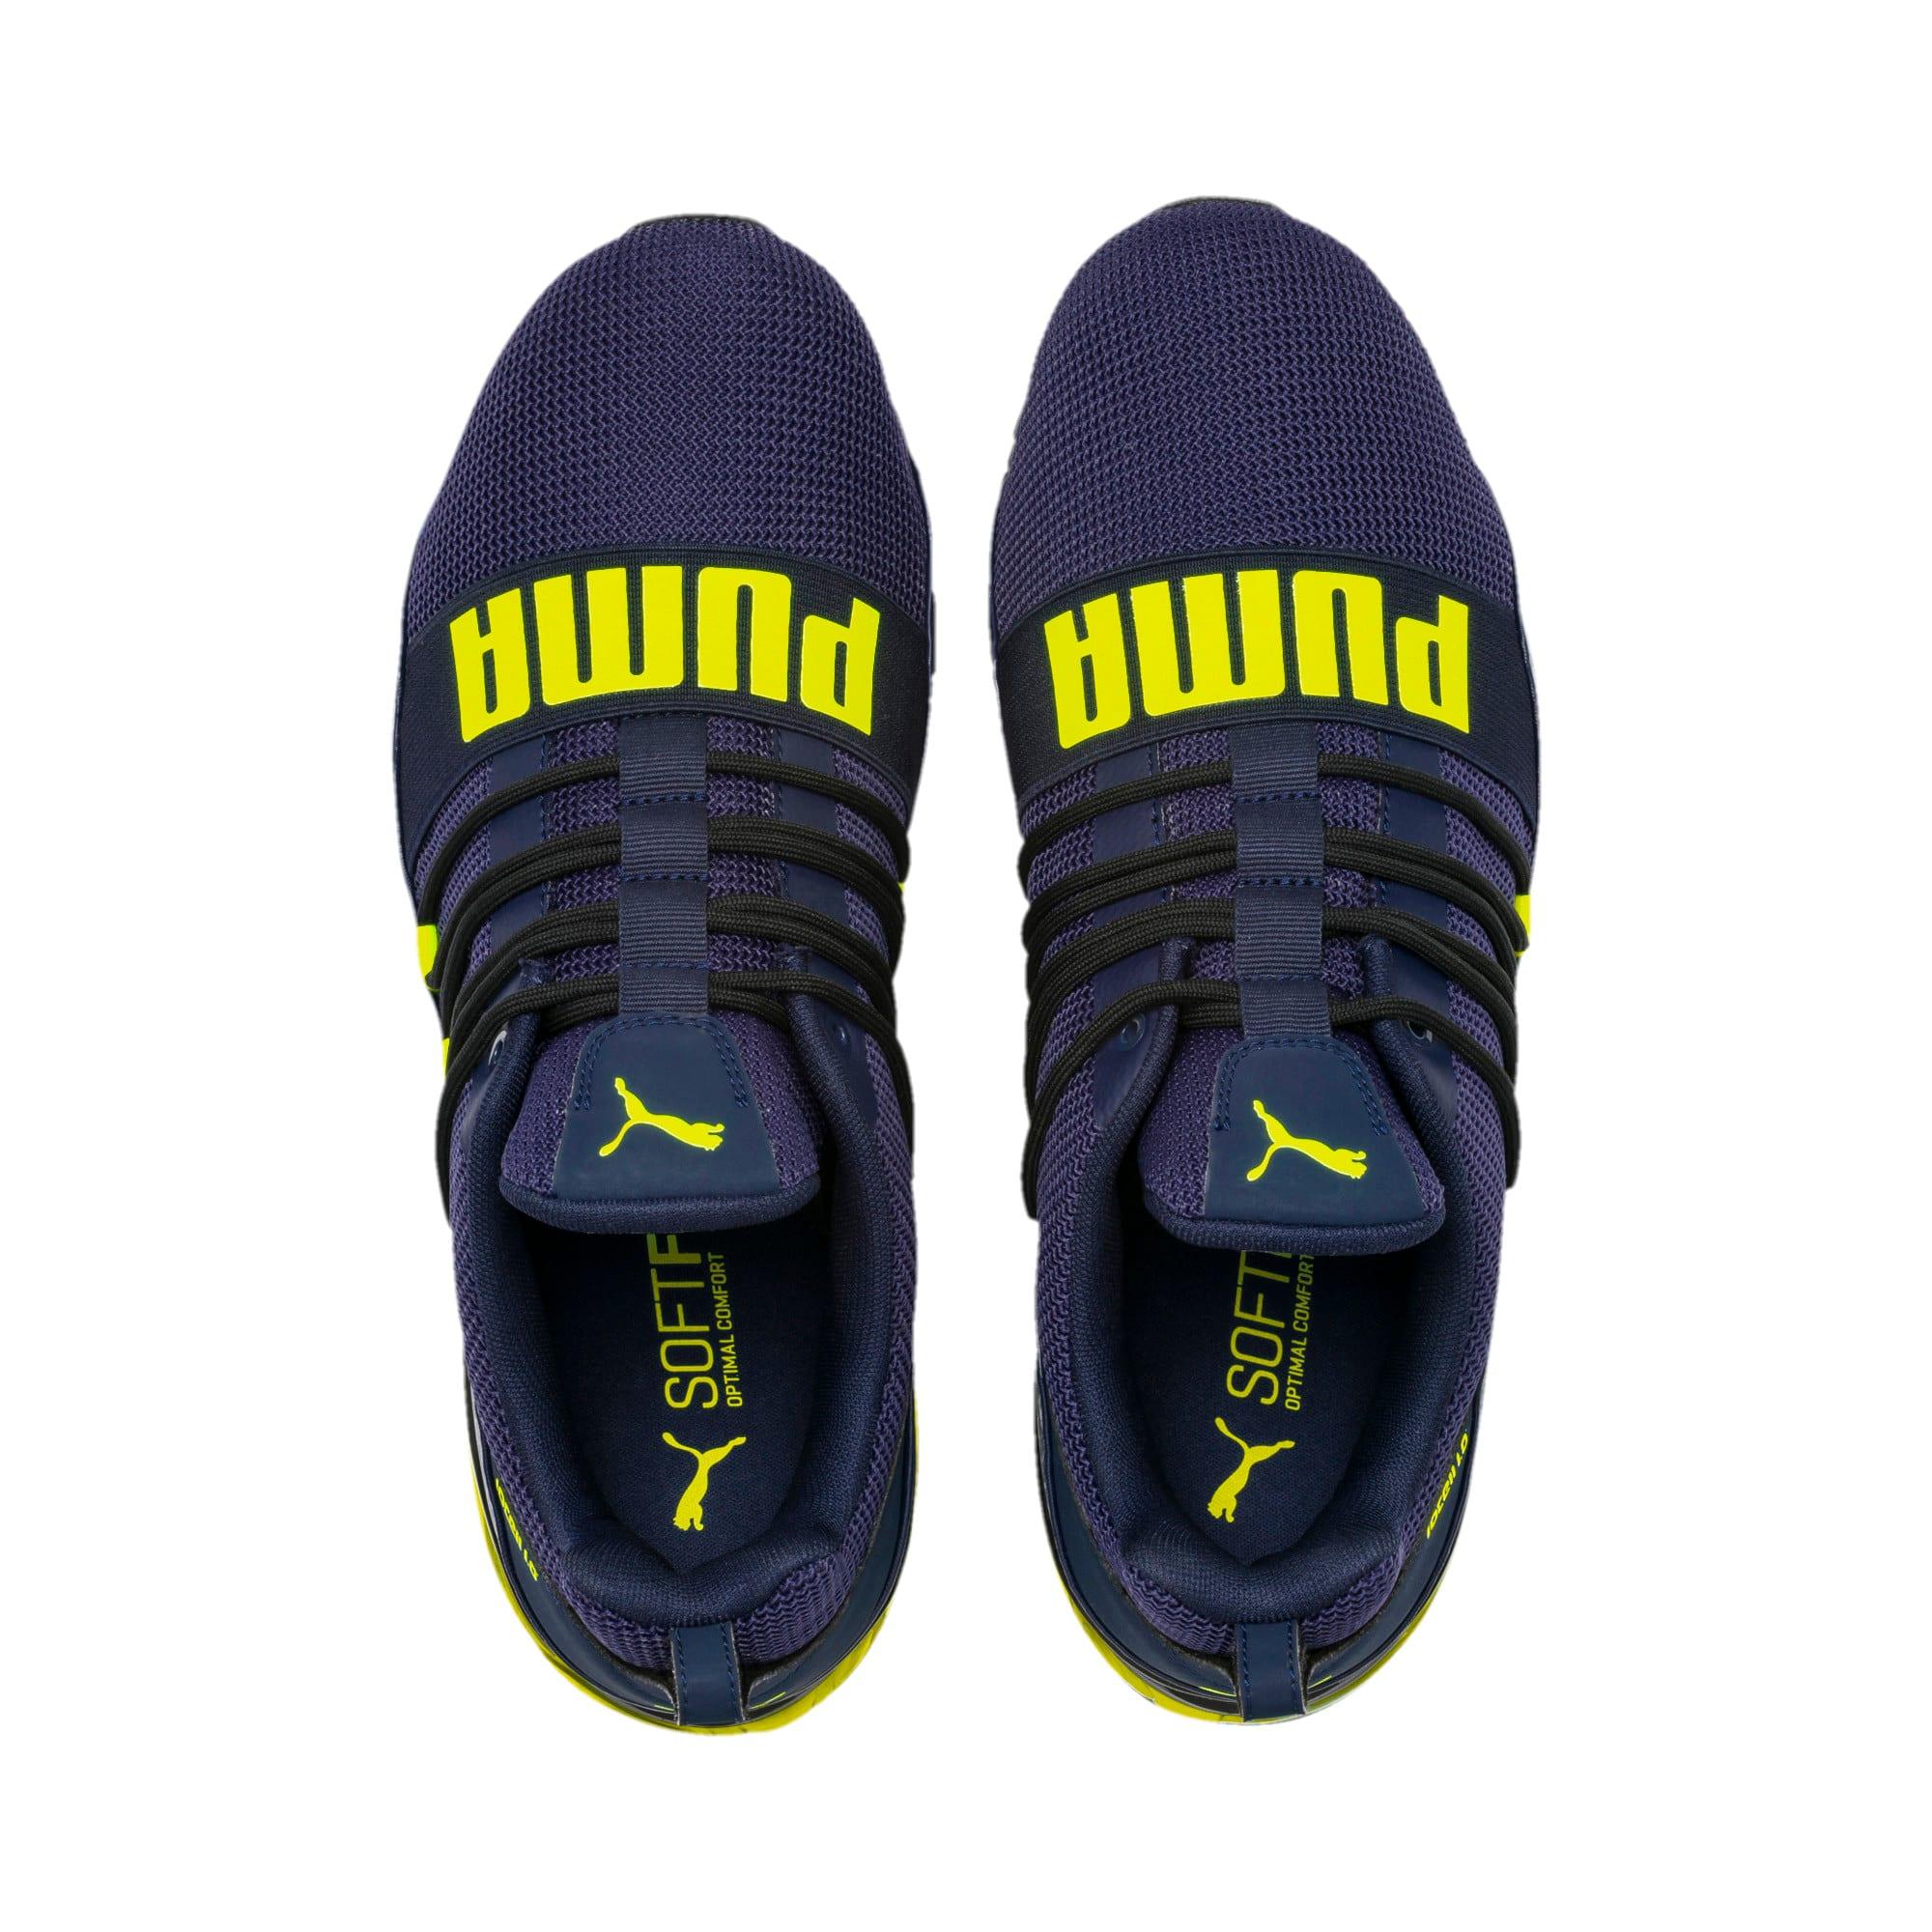 Thumbnail 7 of CELL Regulate Camo Men's Training Shoes, Peacoat-Yellow Alert, medium